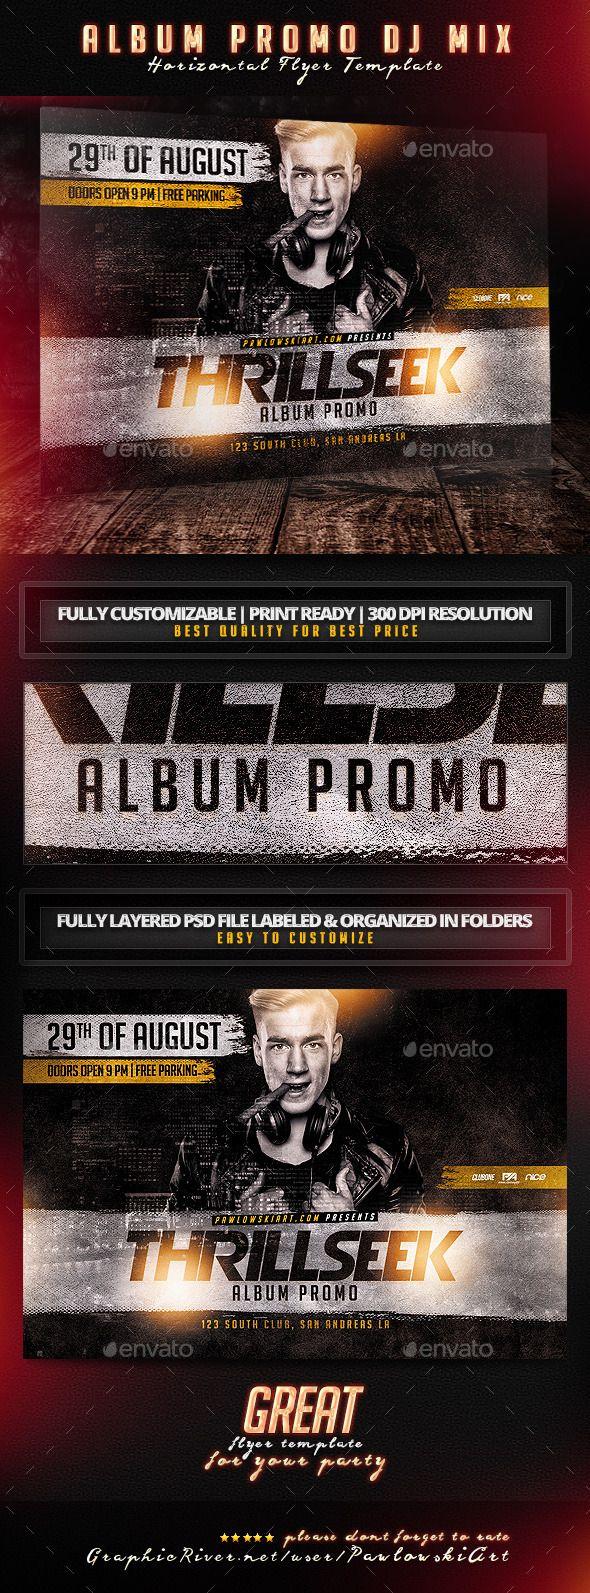 Album Promo DJ Mix Horizontal Flyer Template - Concerts Events